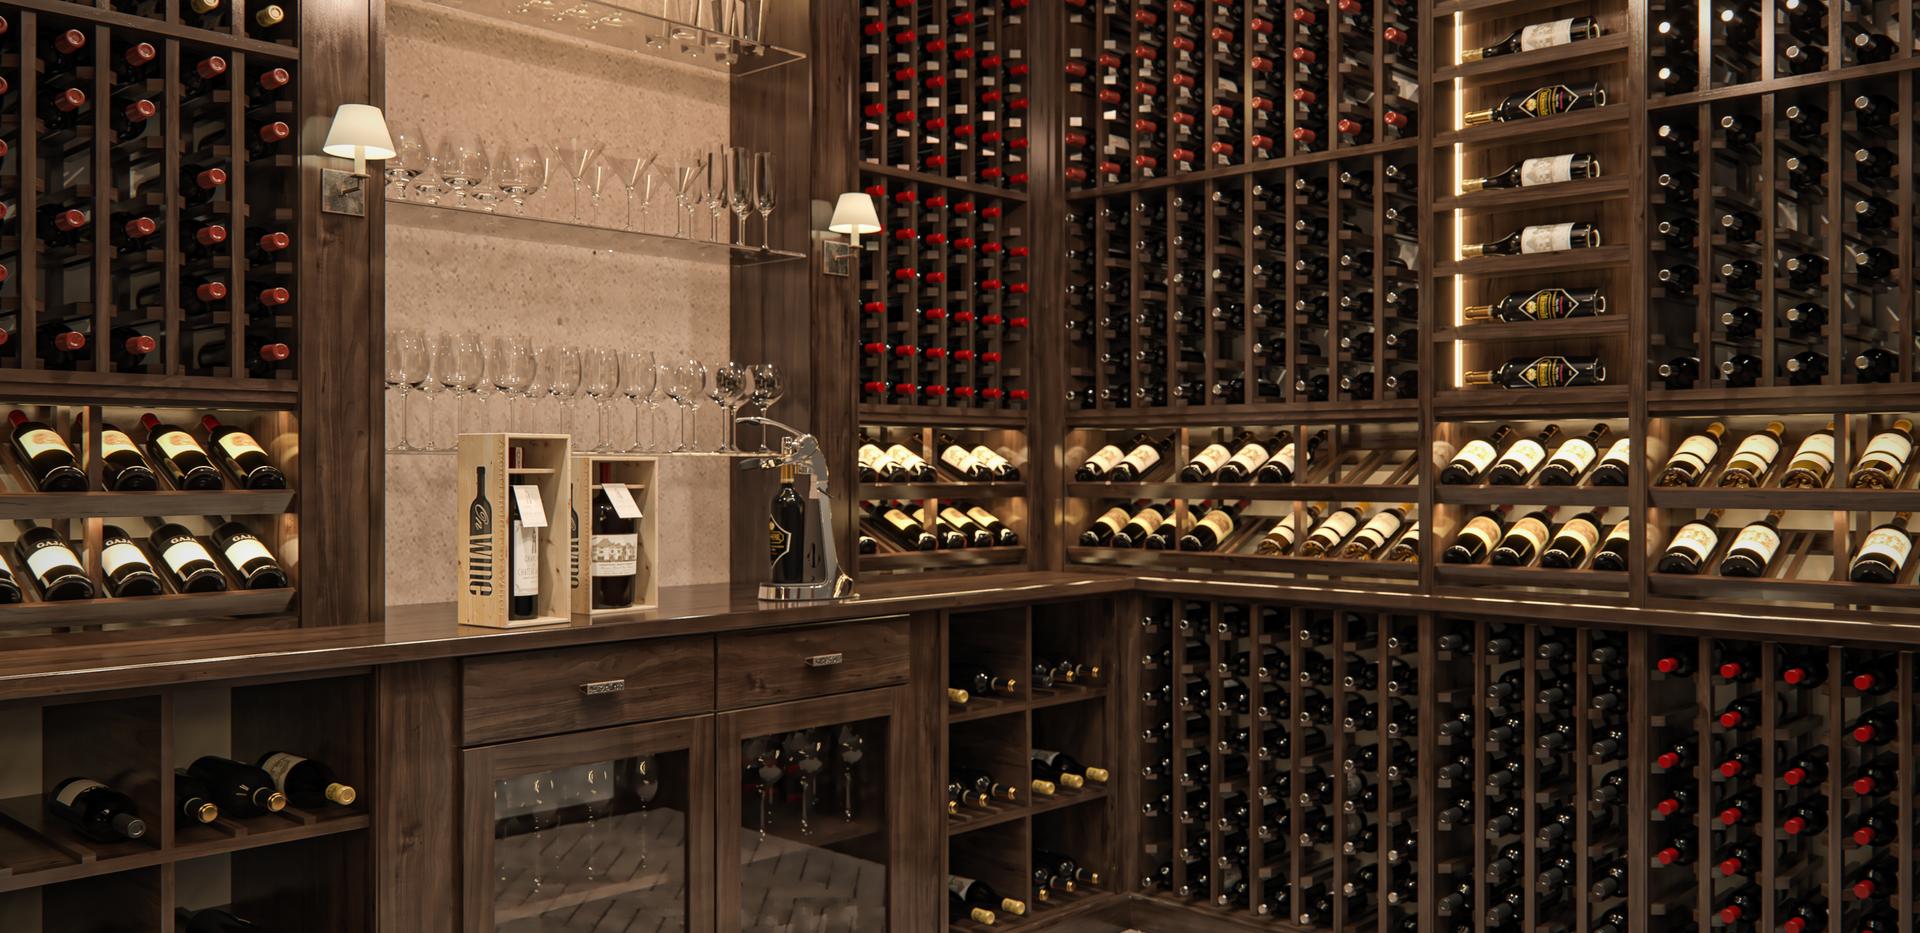 wine cellar view 2.tif